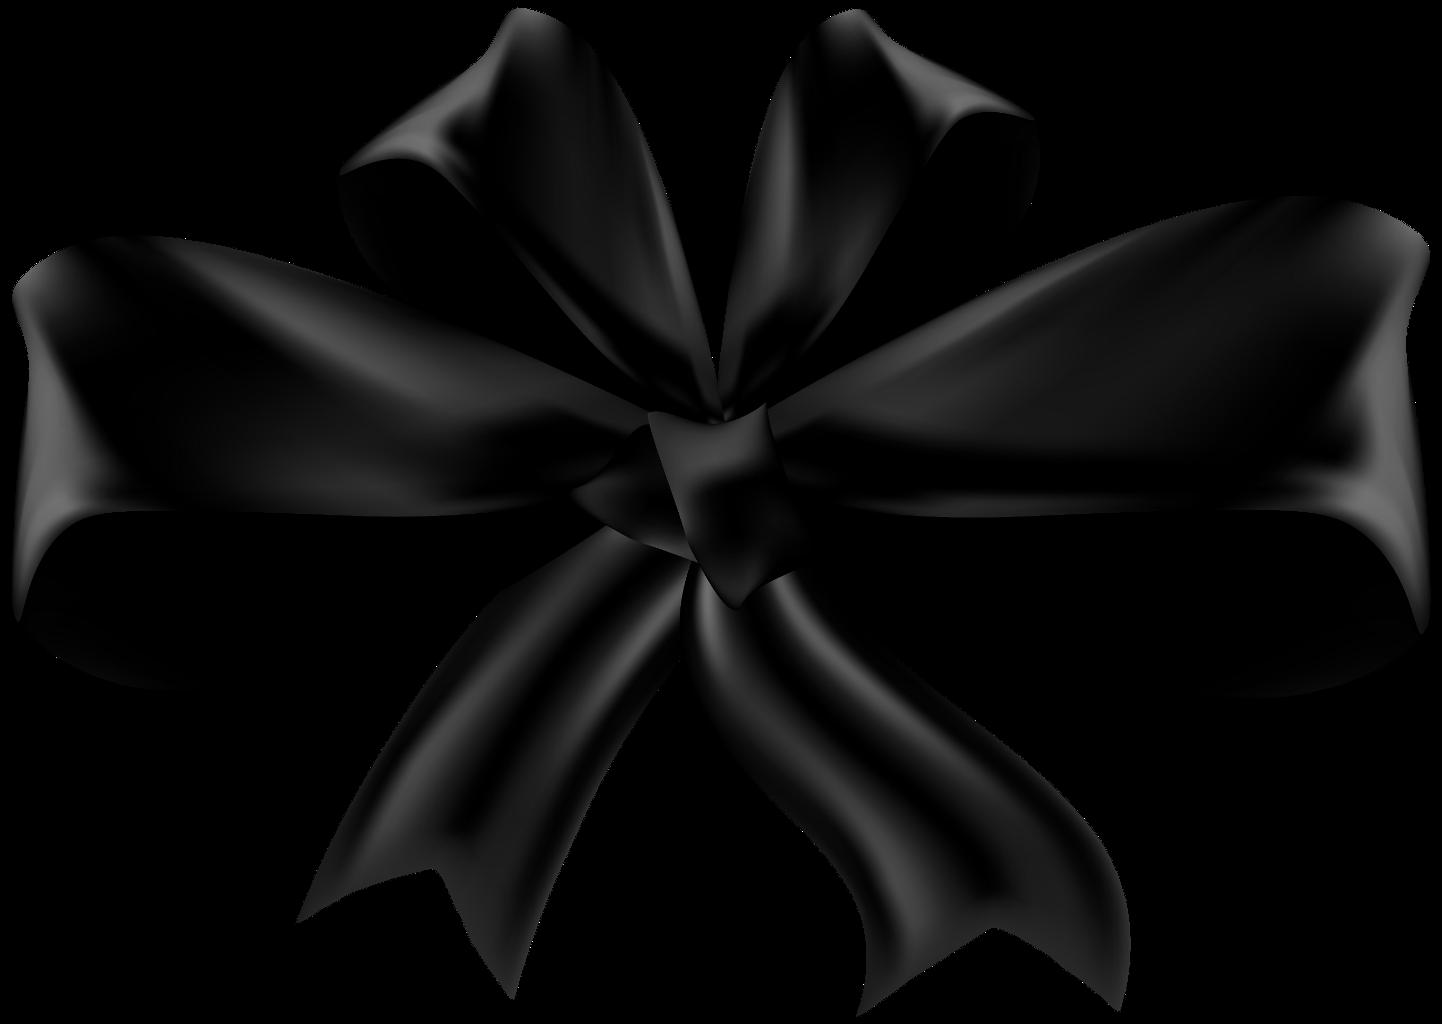 Https www google com images hpp ribbon black 96x136 clipart.